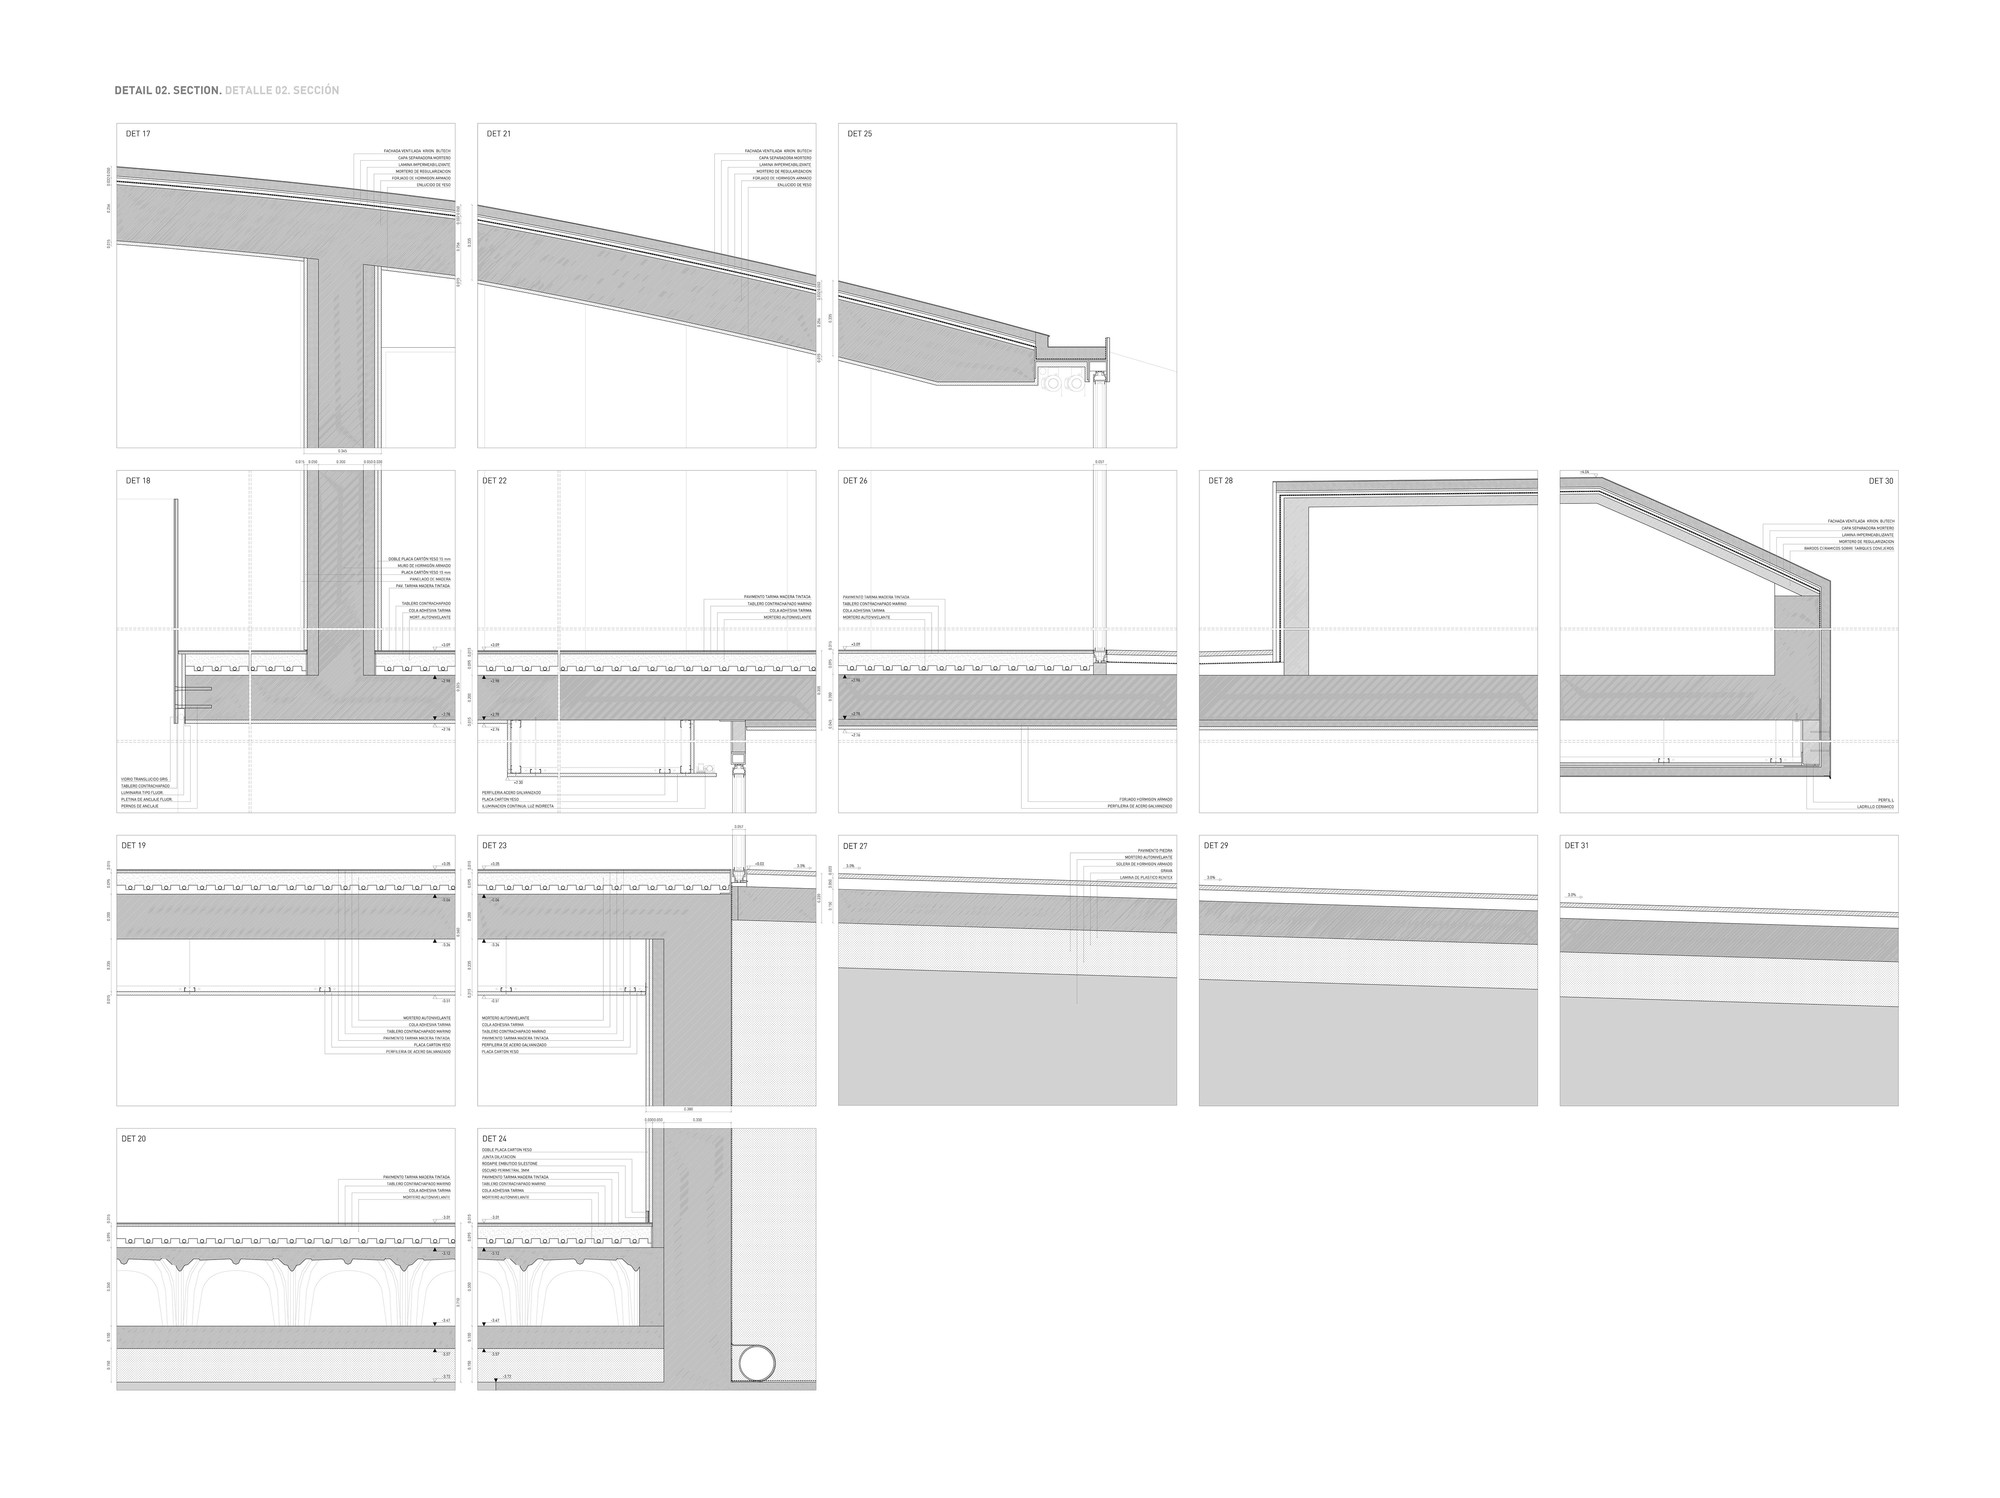 Gallery of balint house fran silvestre arquitectos 28 - Fran silvestre arquitectos ...